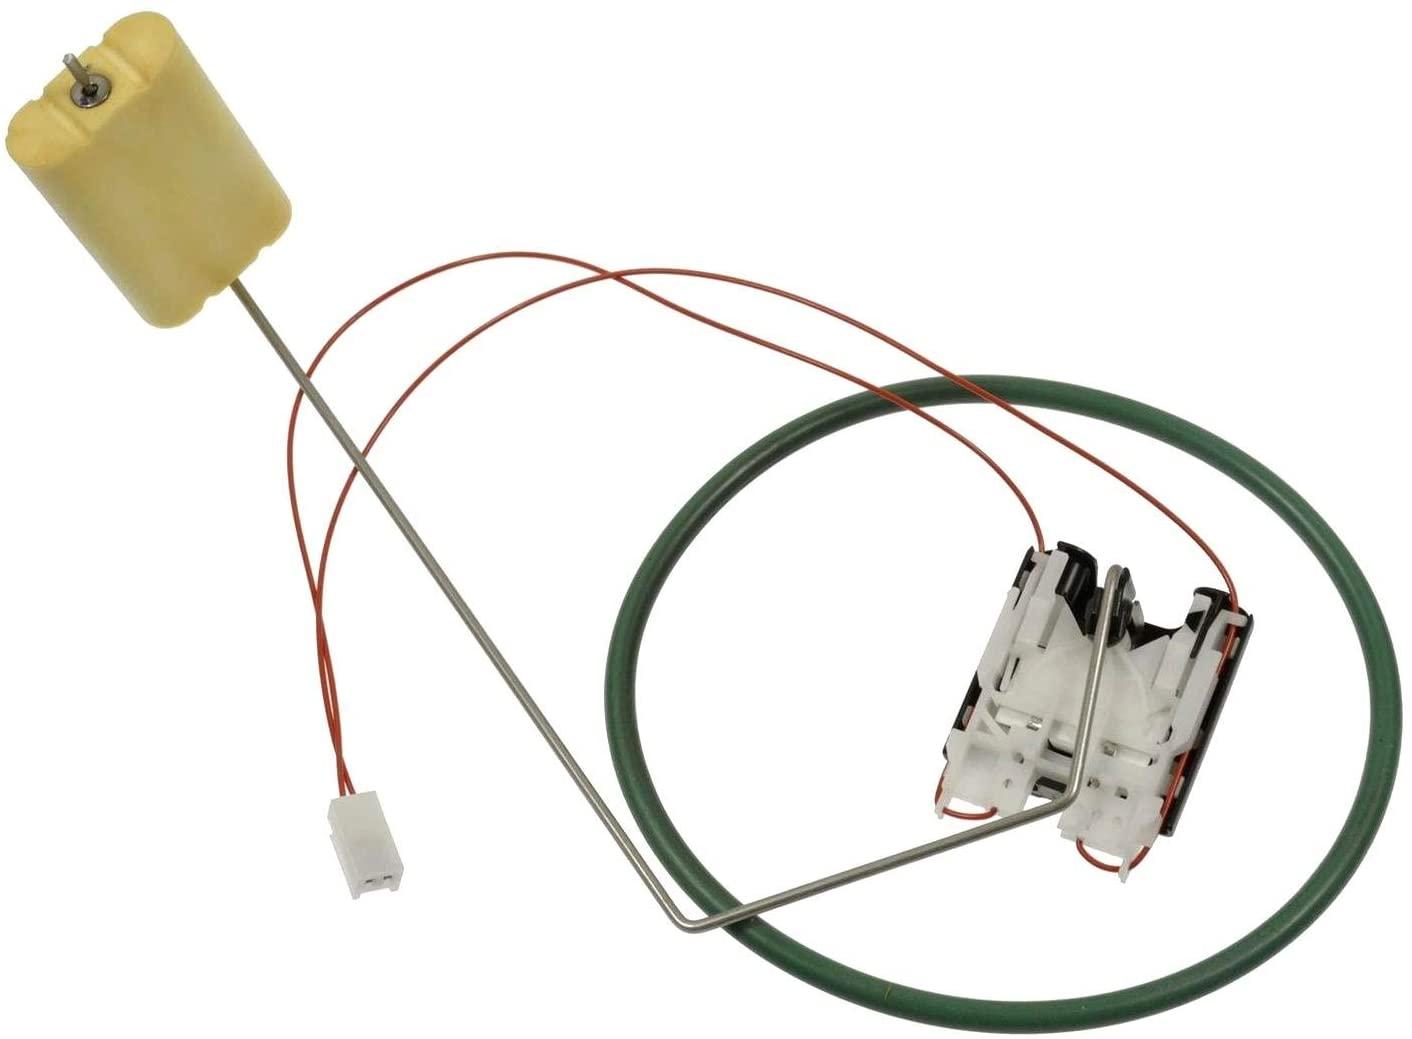 TechSmart K07021 Fuel Level Sensor